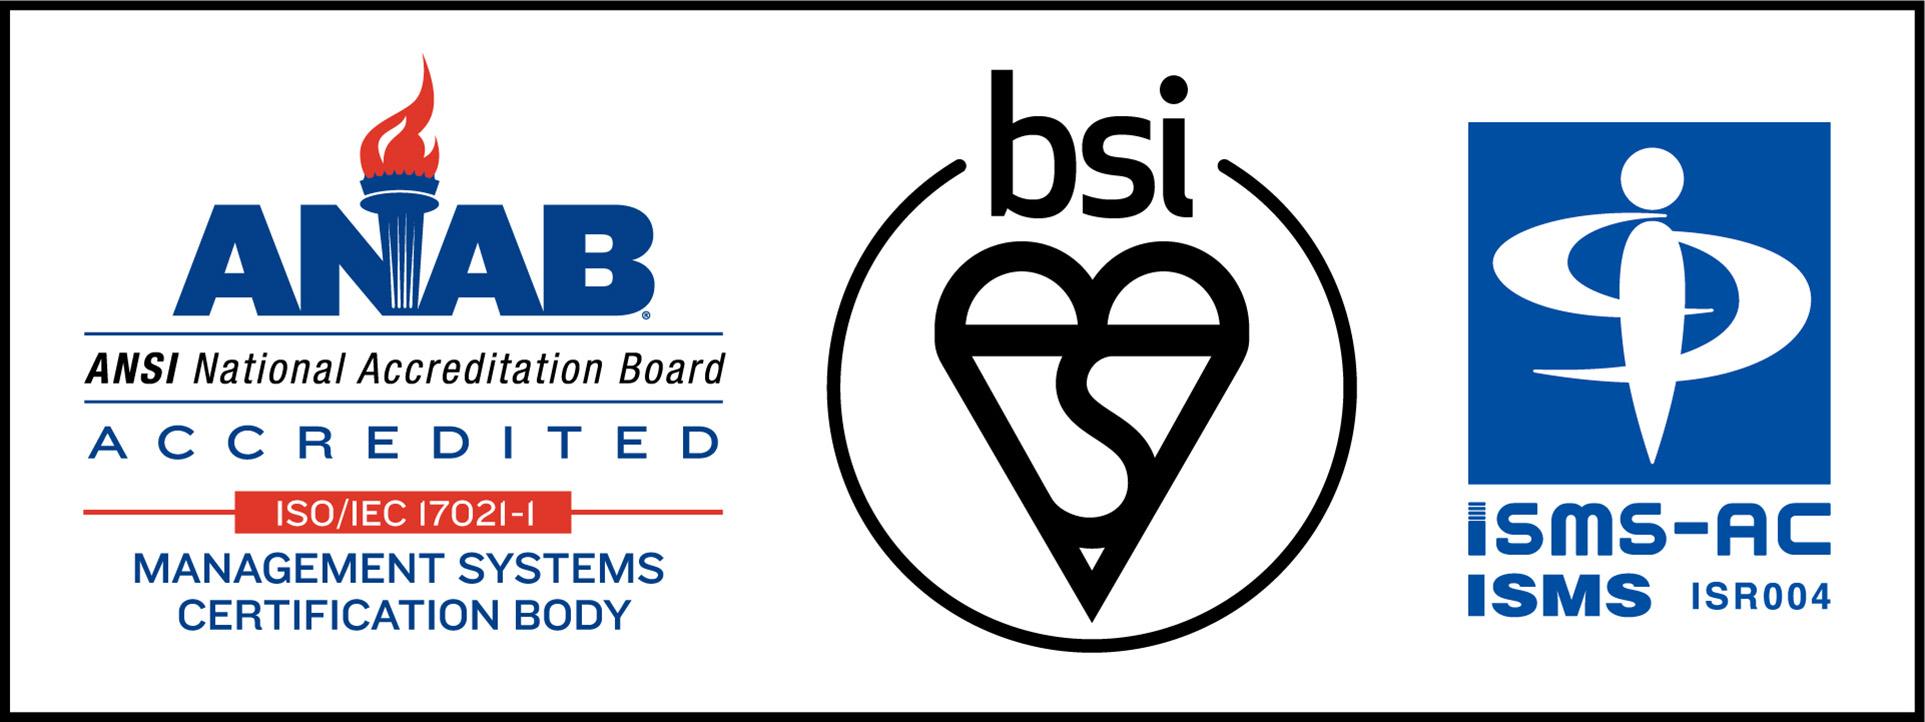 ANAB|bsi|ISMS-AC